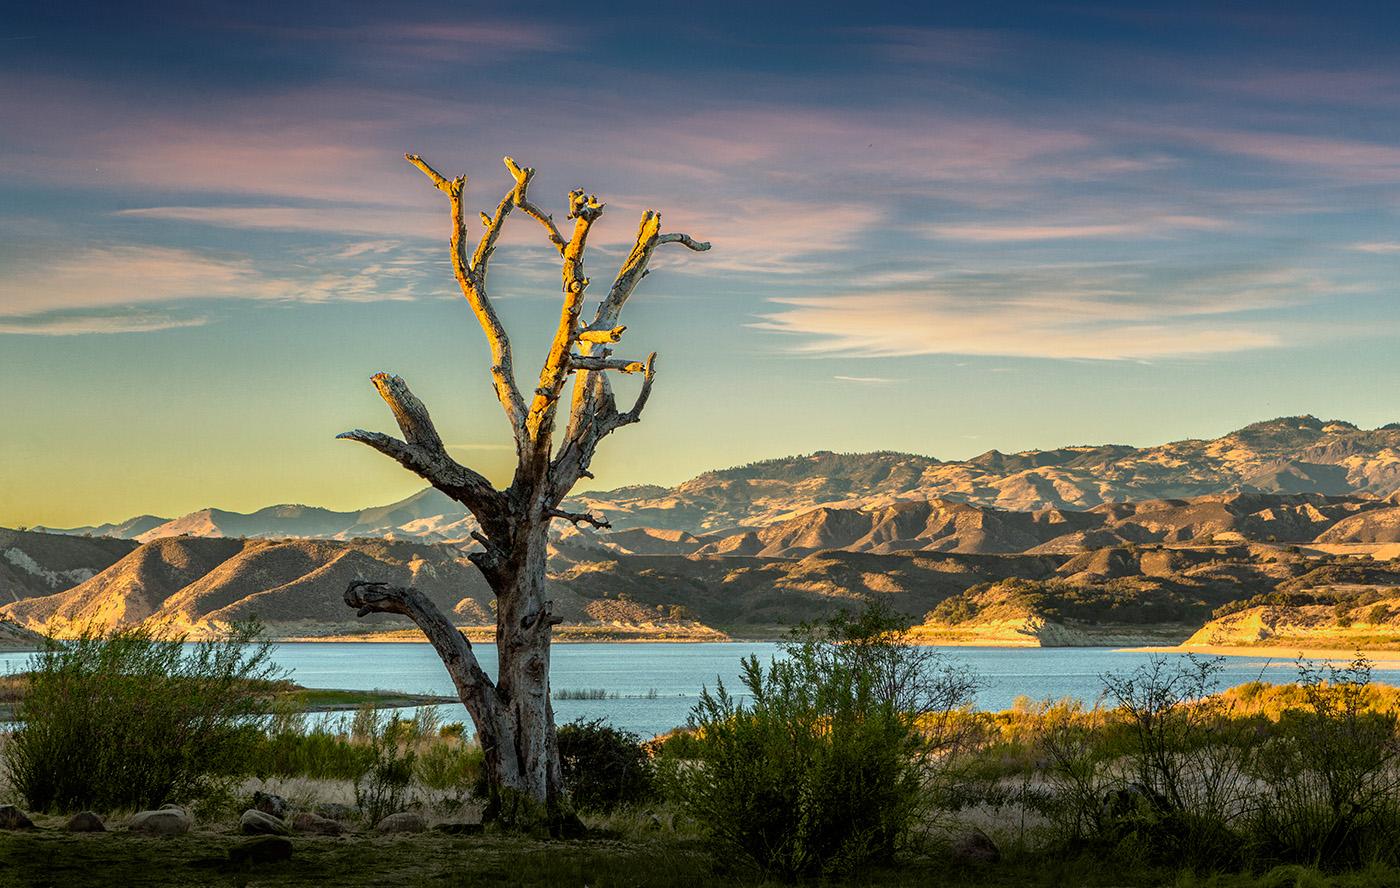 The_Tree_At_Lake_Cachuma%%Ope%%Ken_Pfeiffer.jpg